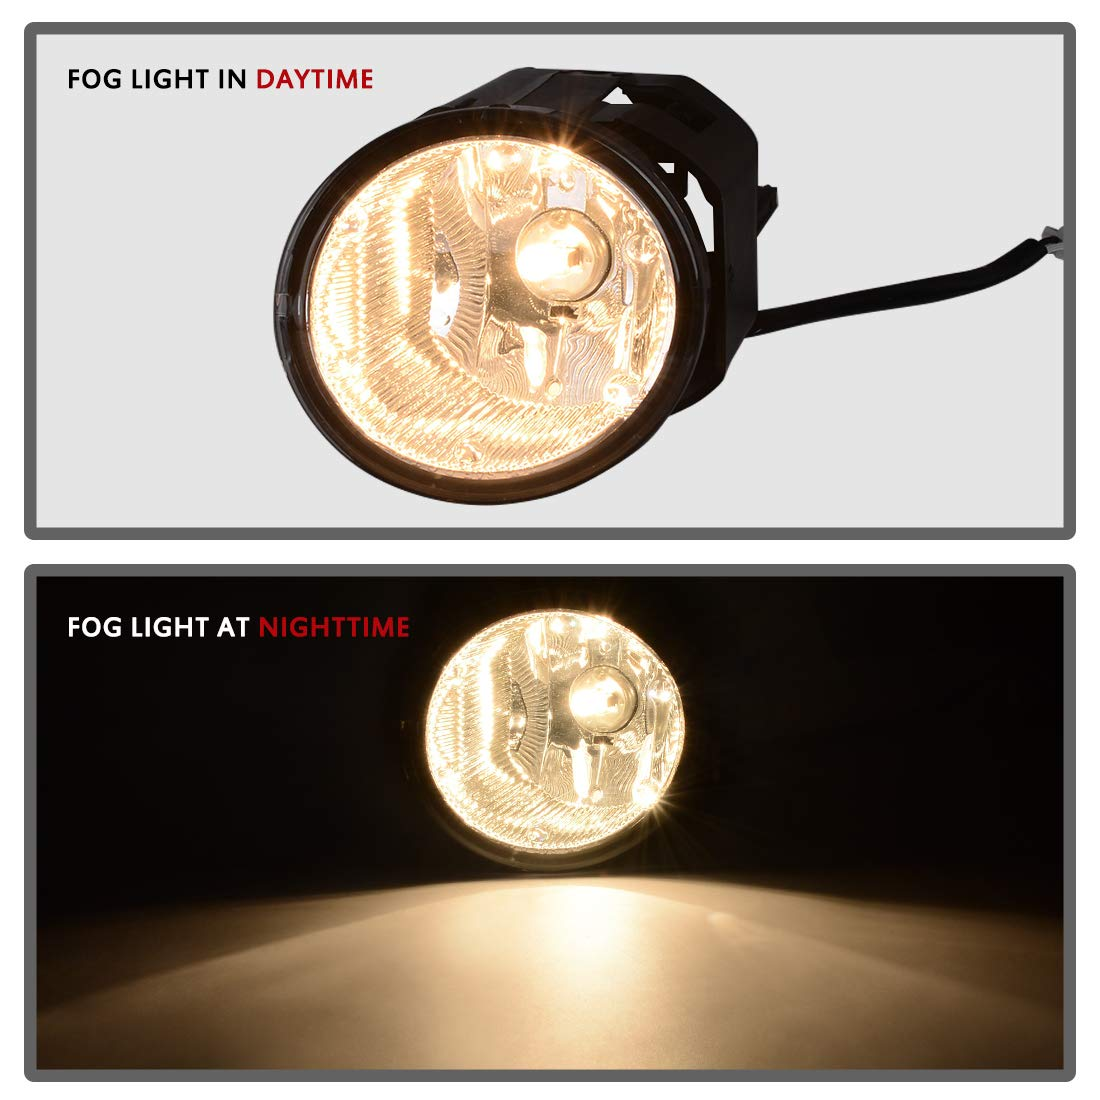 Autosaver88 Fog Lights H3 12v 55w Halogen Lamp For 2016 Nissan Maxima Wiring Diagram Sentra 2000 2003 Frontier 2001 2004 Xterra 2002 Clear Lens W Bulbs Harness Automotive